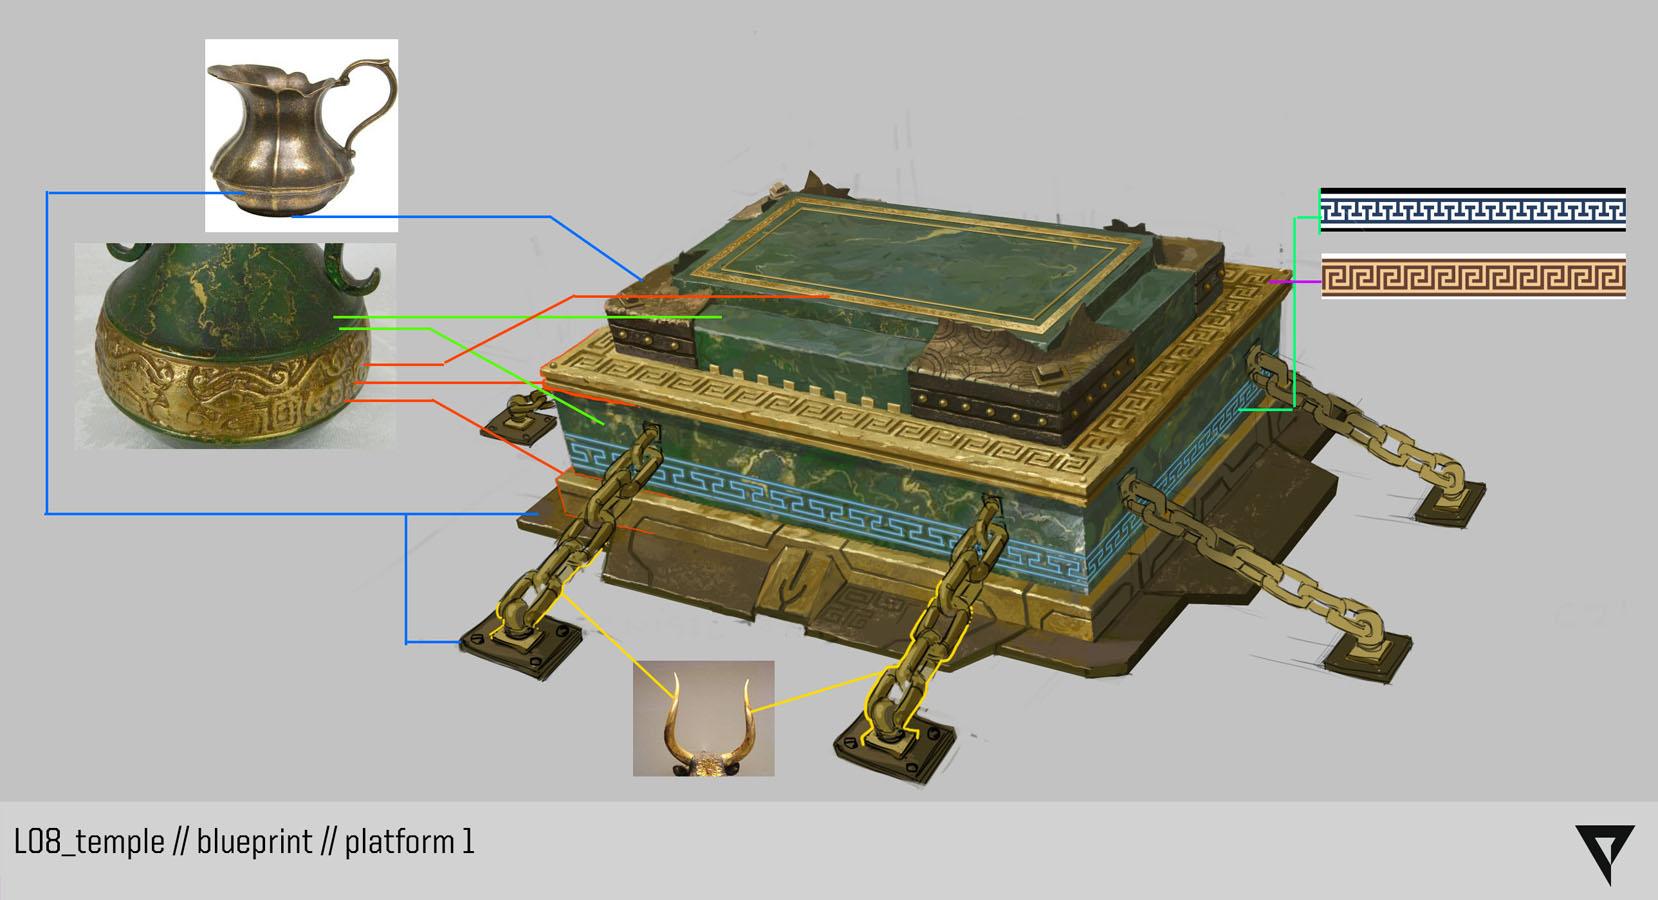 L08_temple_blueprint_platform 1.jpg